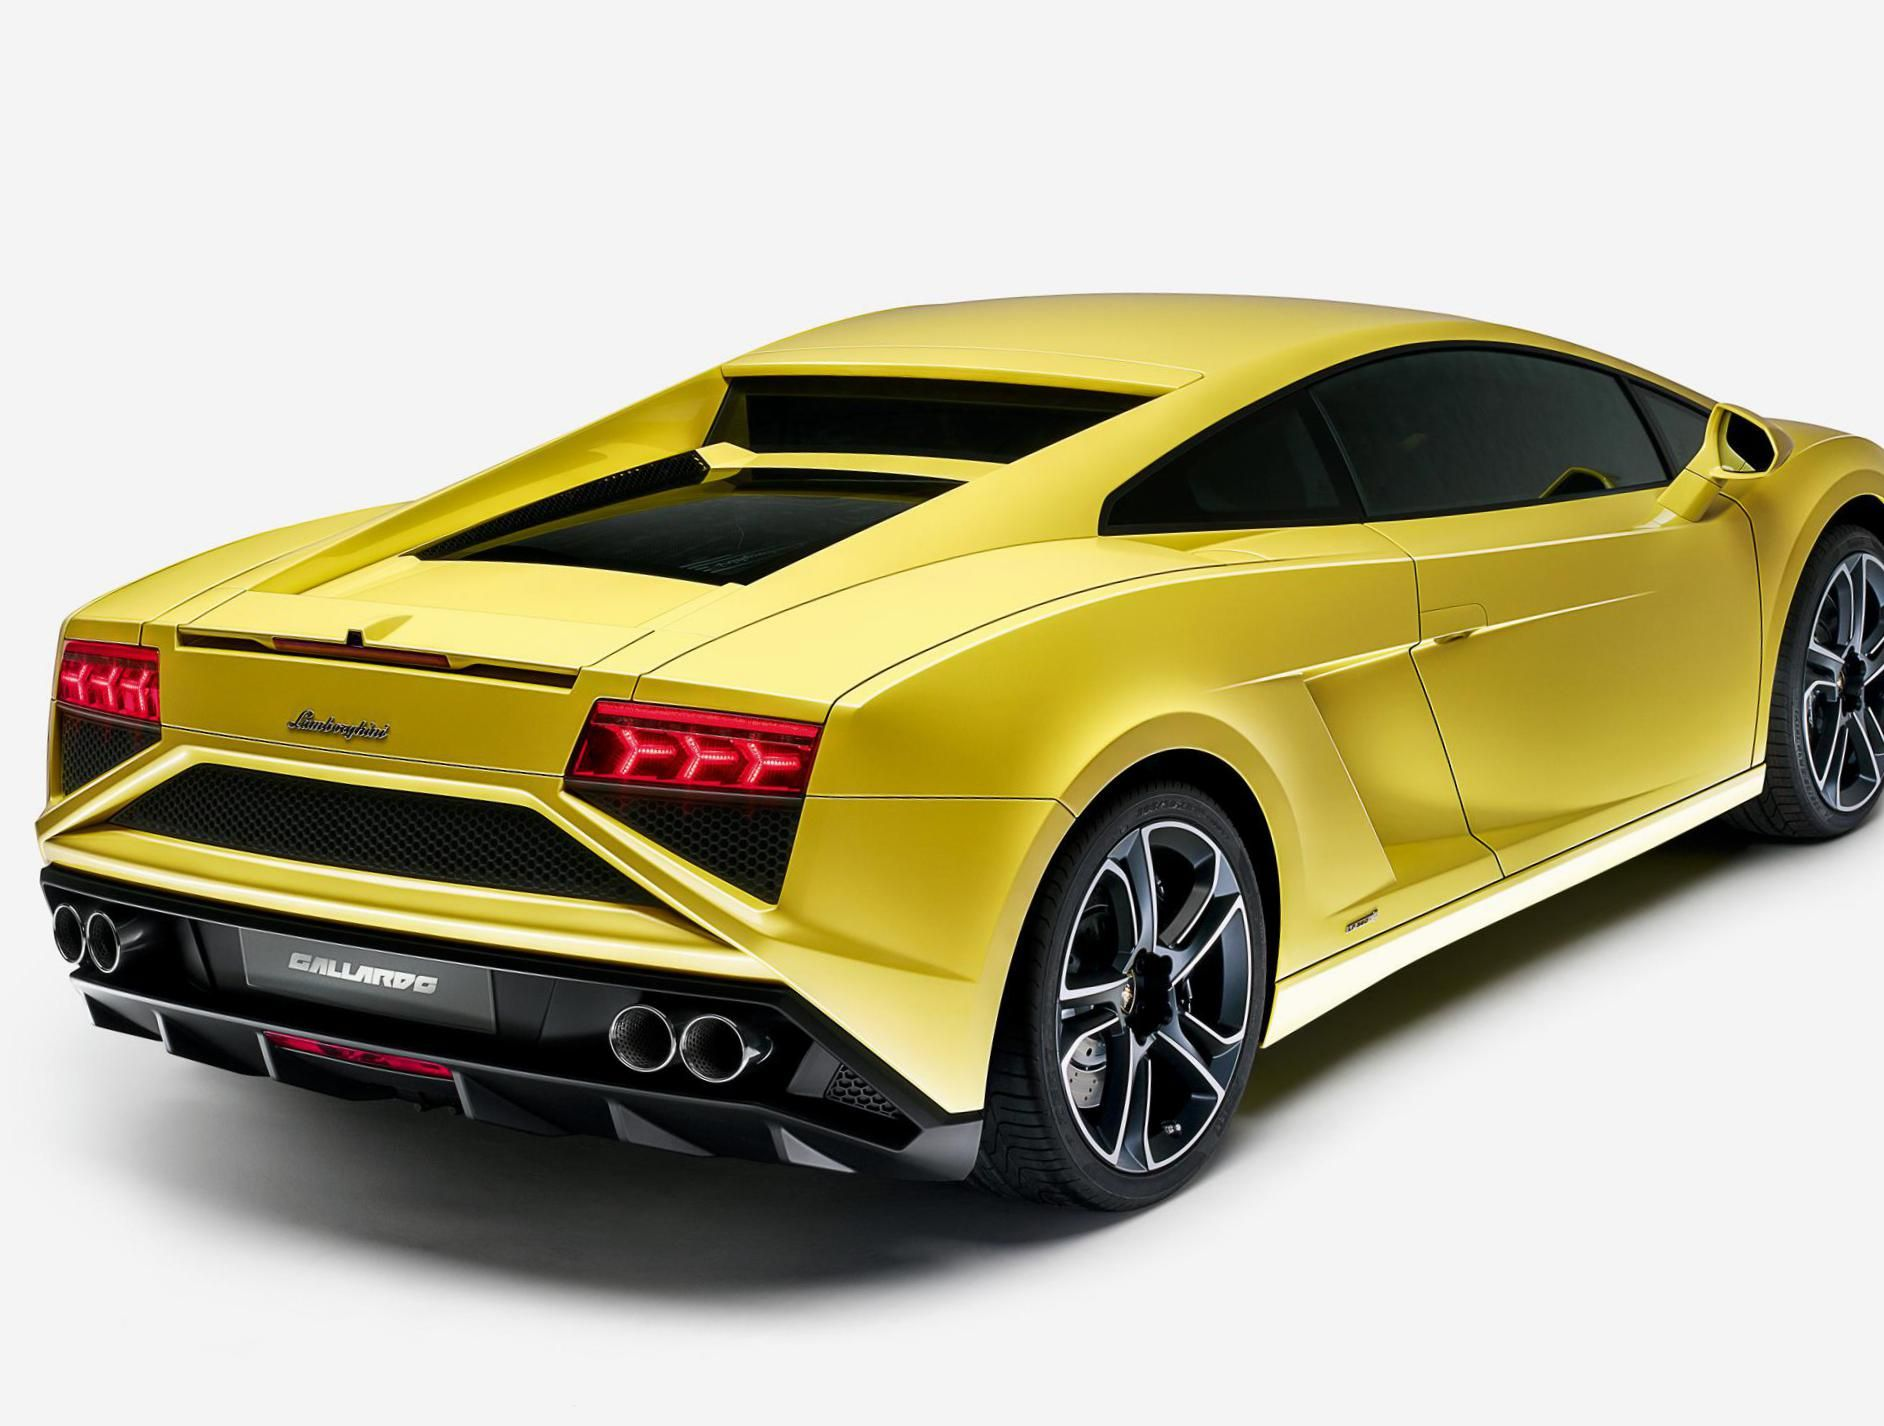 Gallardo Lp 560 4 Lamborghini Approved Http Autotras Com Lamborghini Gallardo Lamborghini Lamborghini Cars